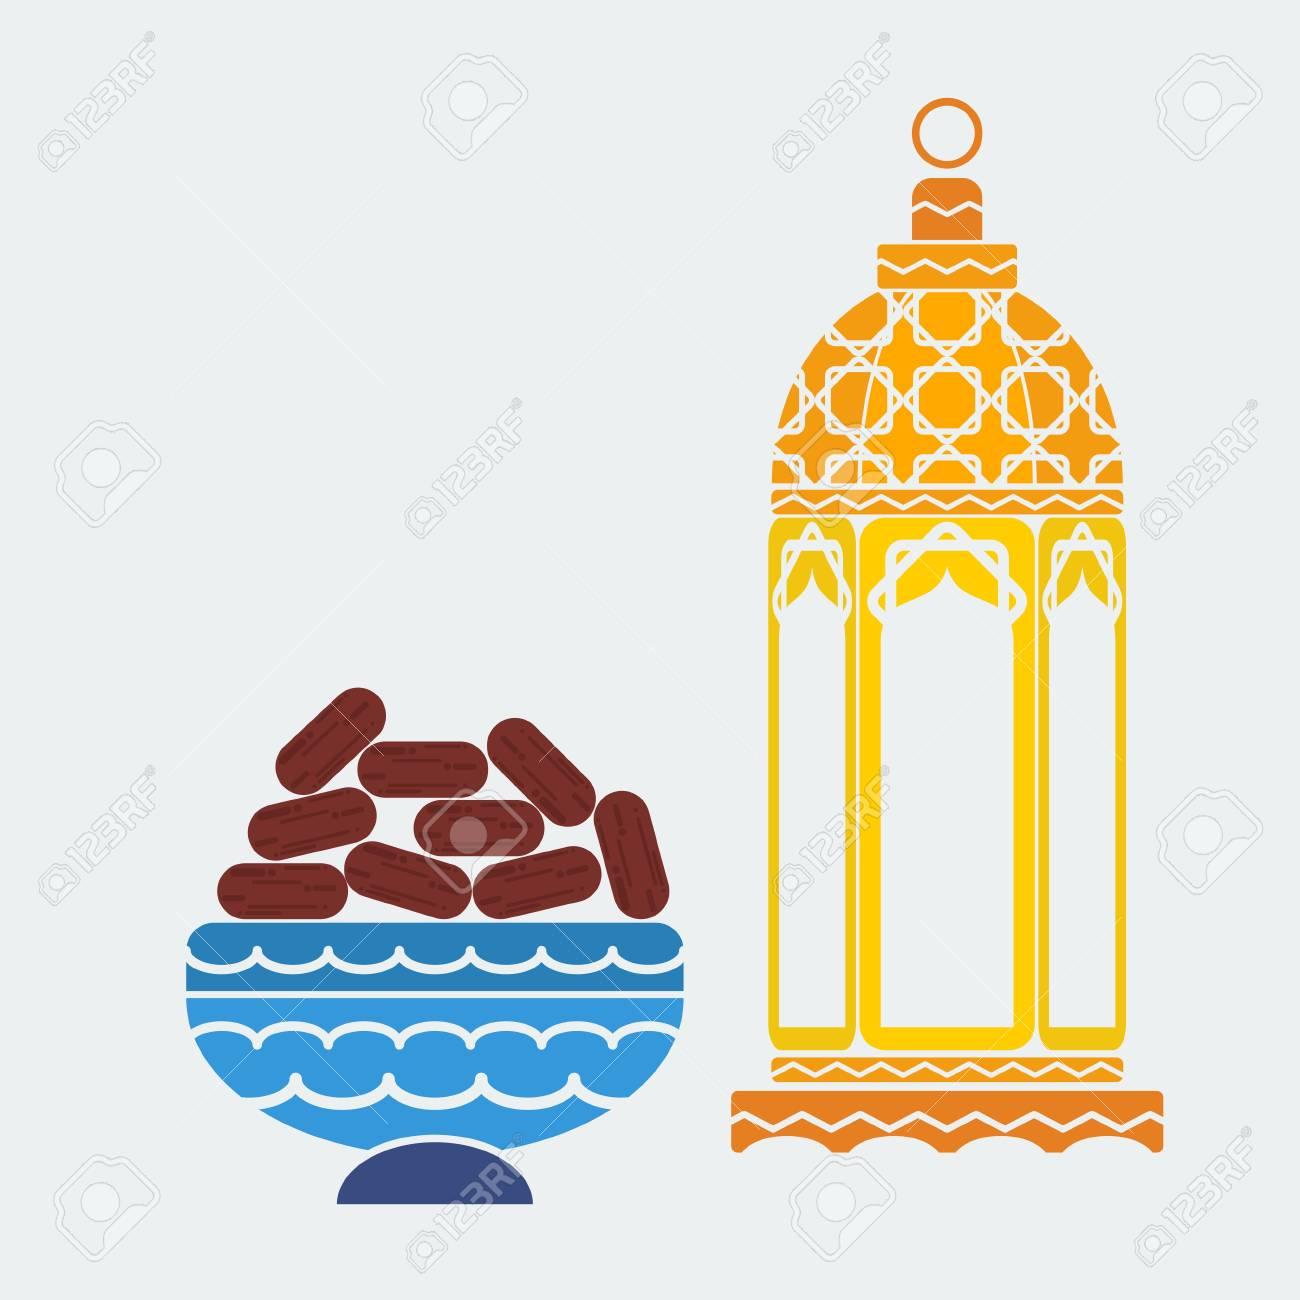 editable arabian lamp and dates fruit vector illustration in